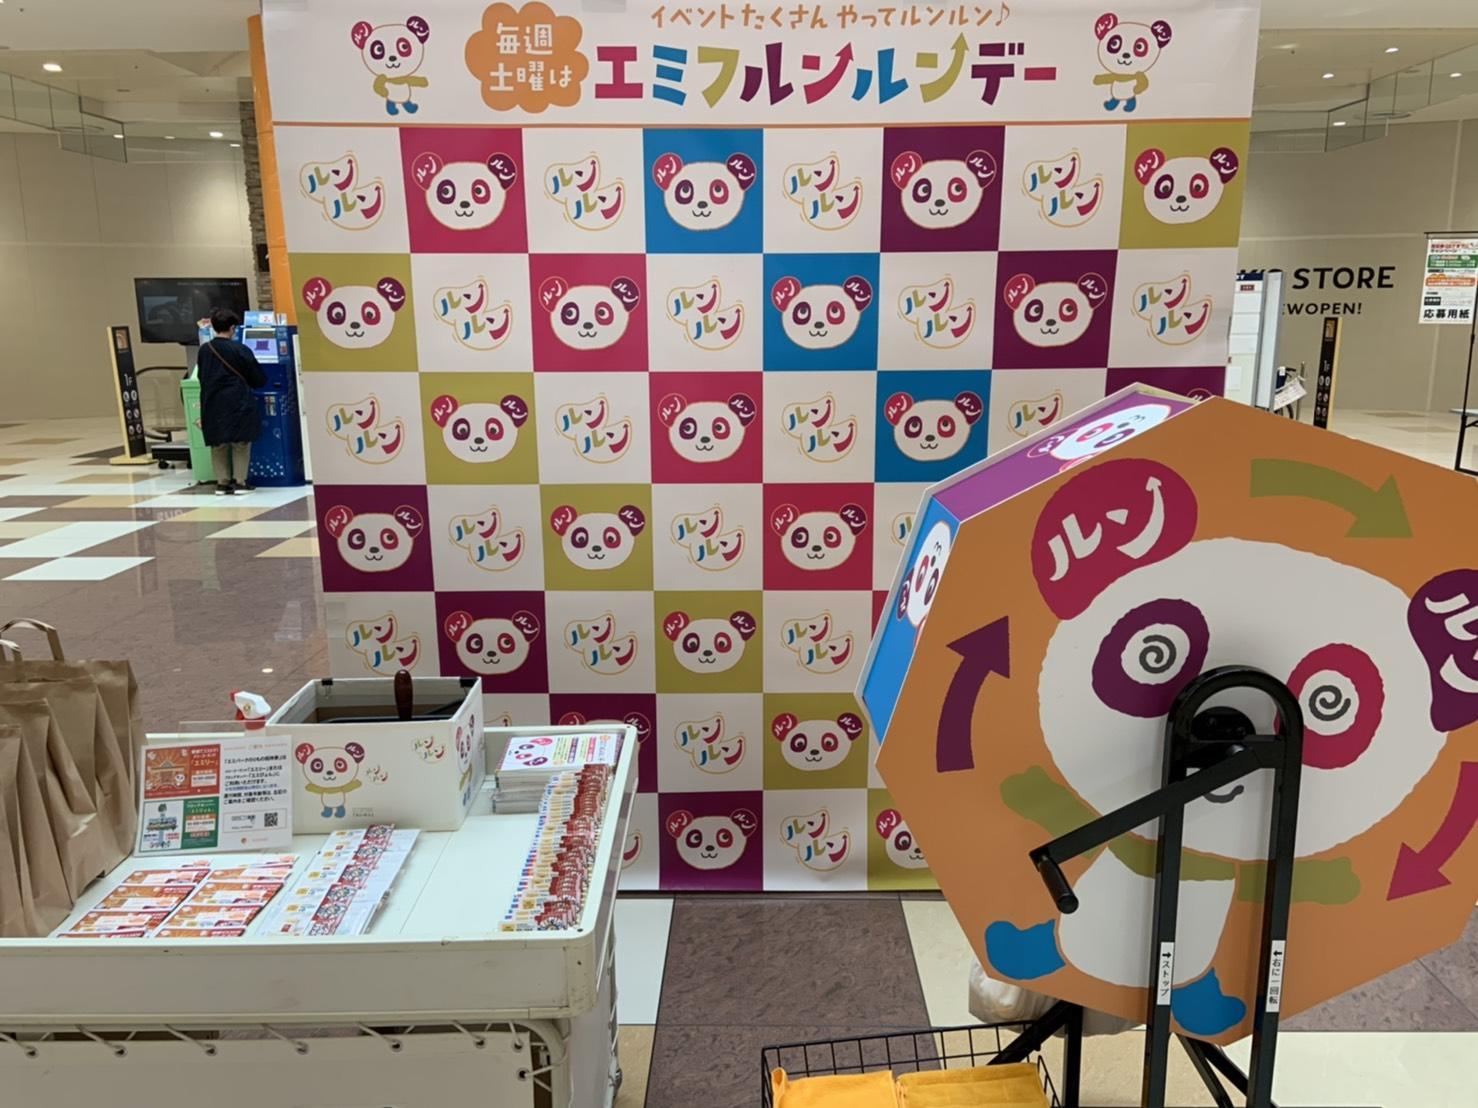 https://emifull.jp/emifulls_blog/13th/2020/09/files/8838e9fa981459b281c7eb182c652430903306ec.jpg